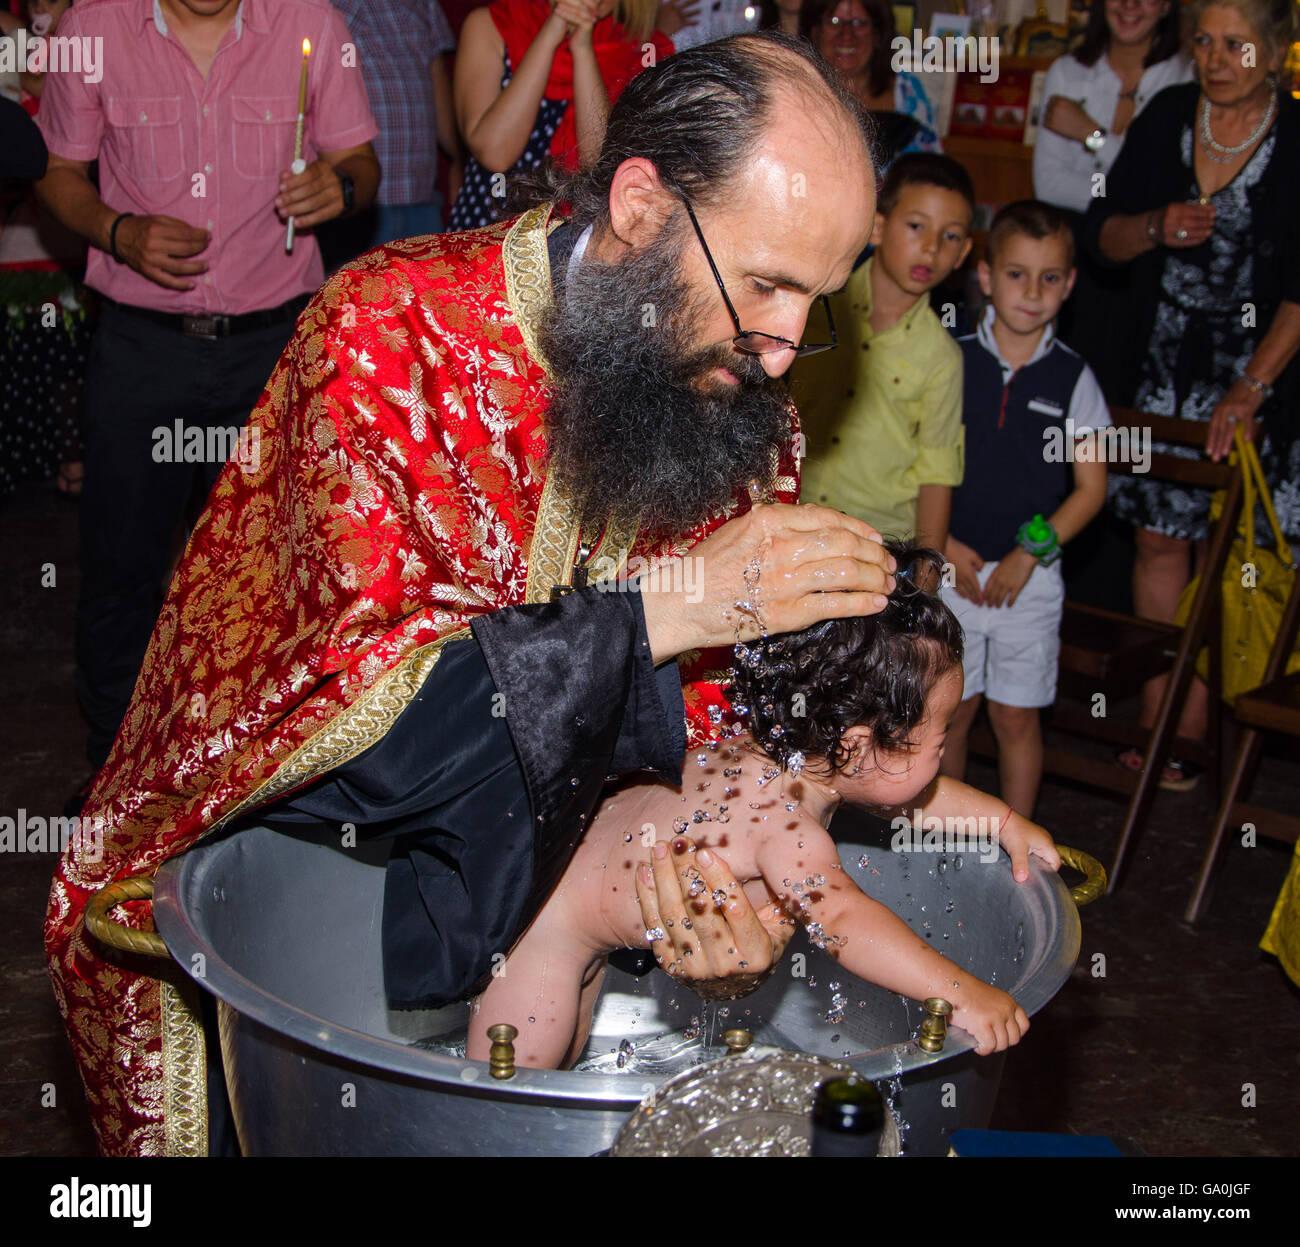 christening baptism - Stock Image